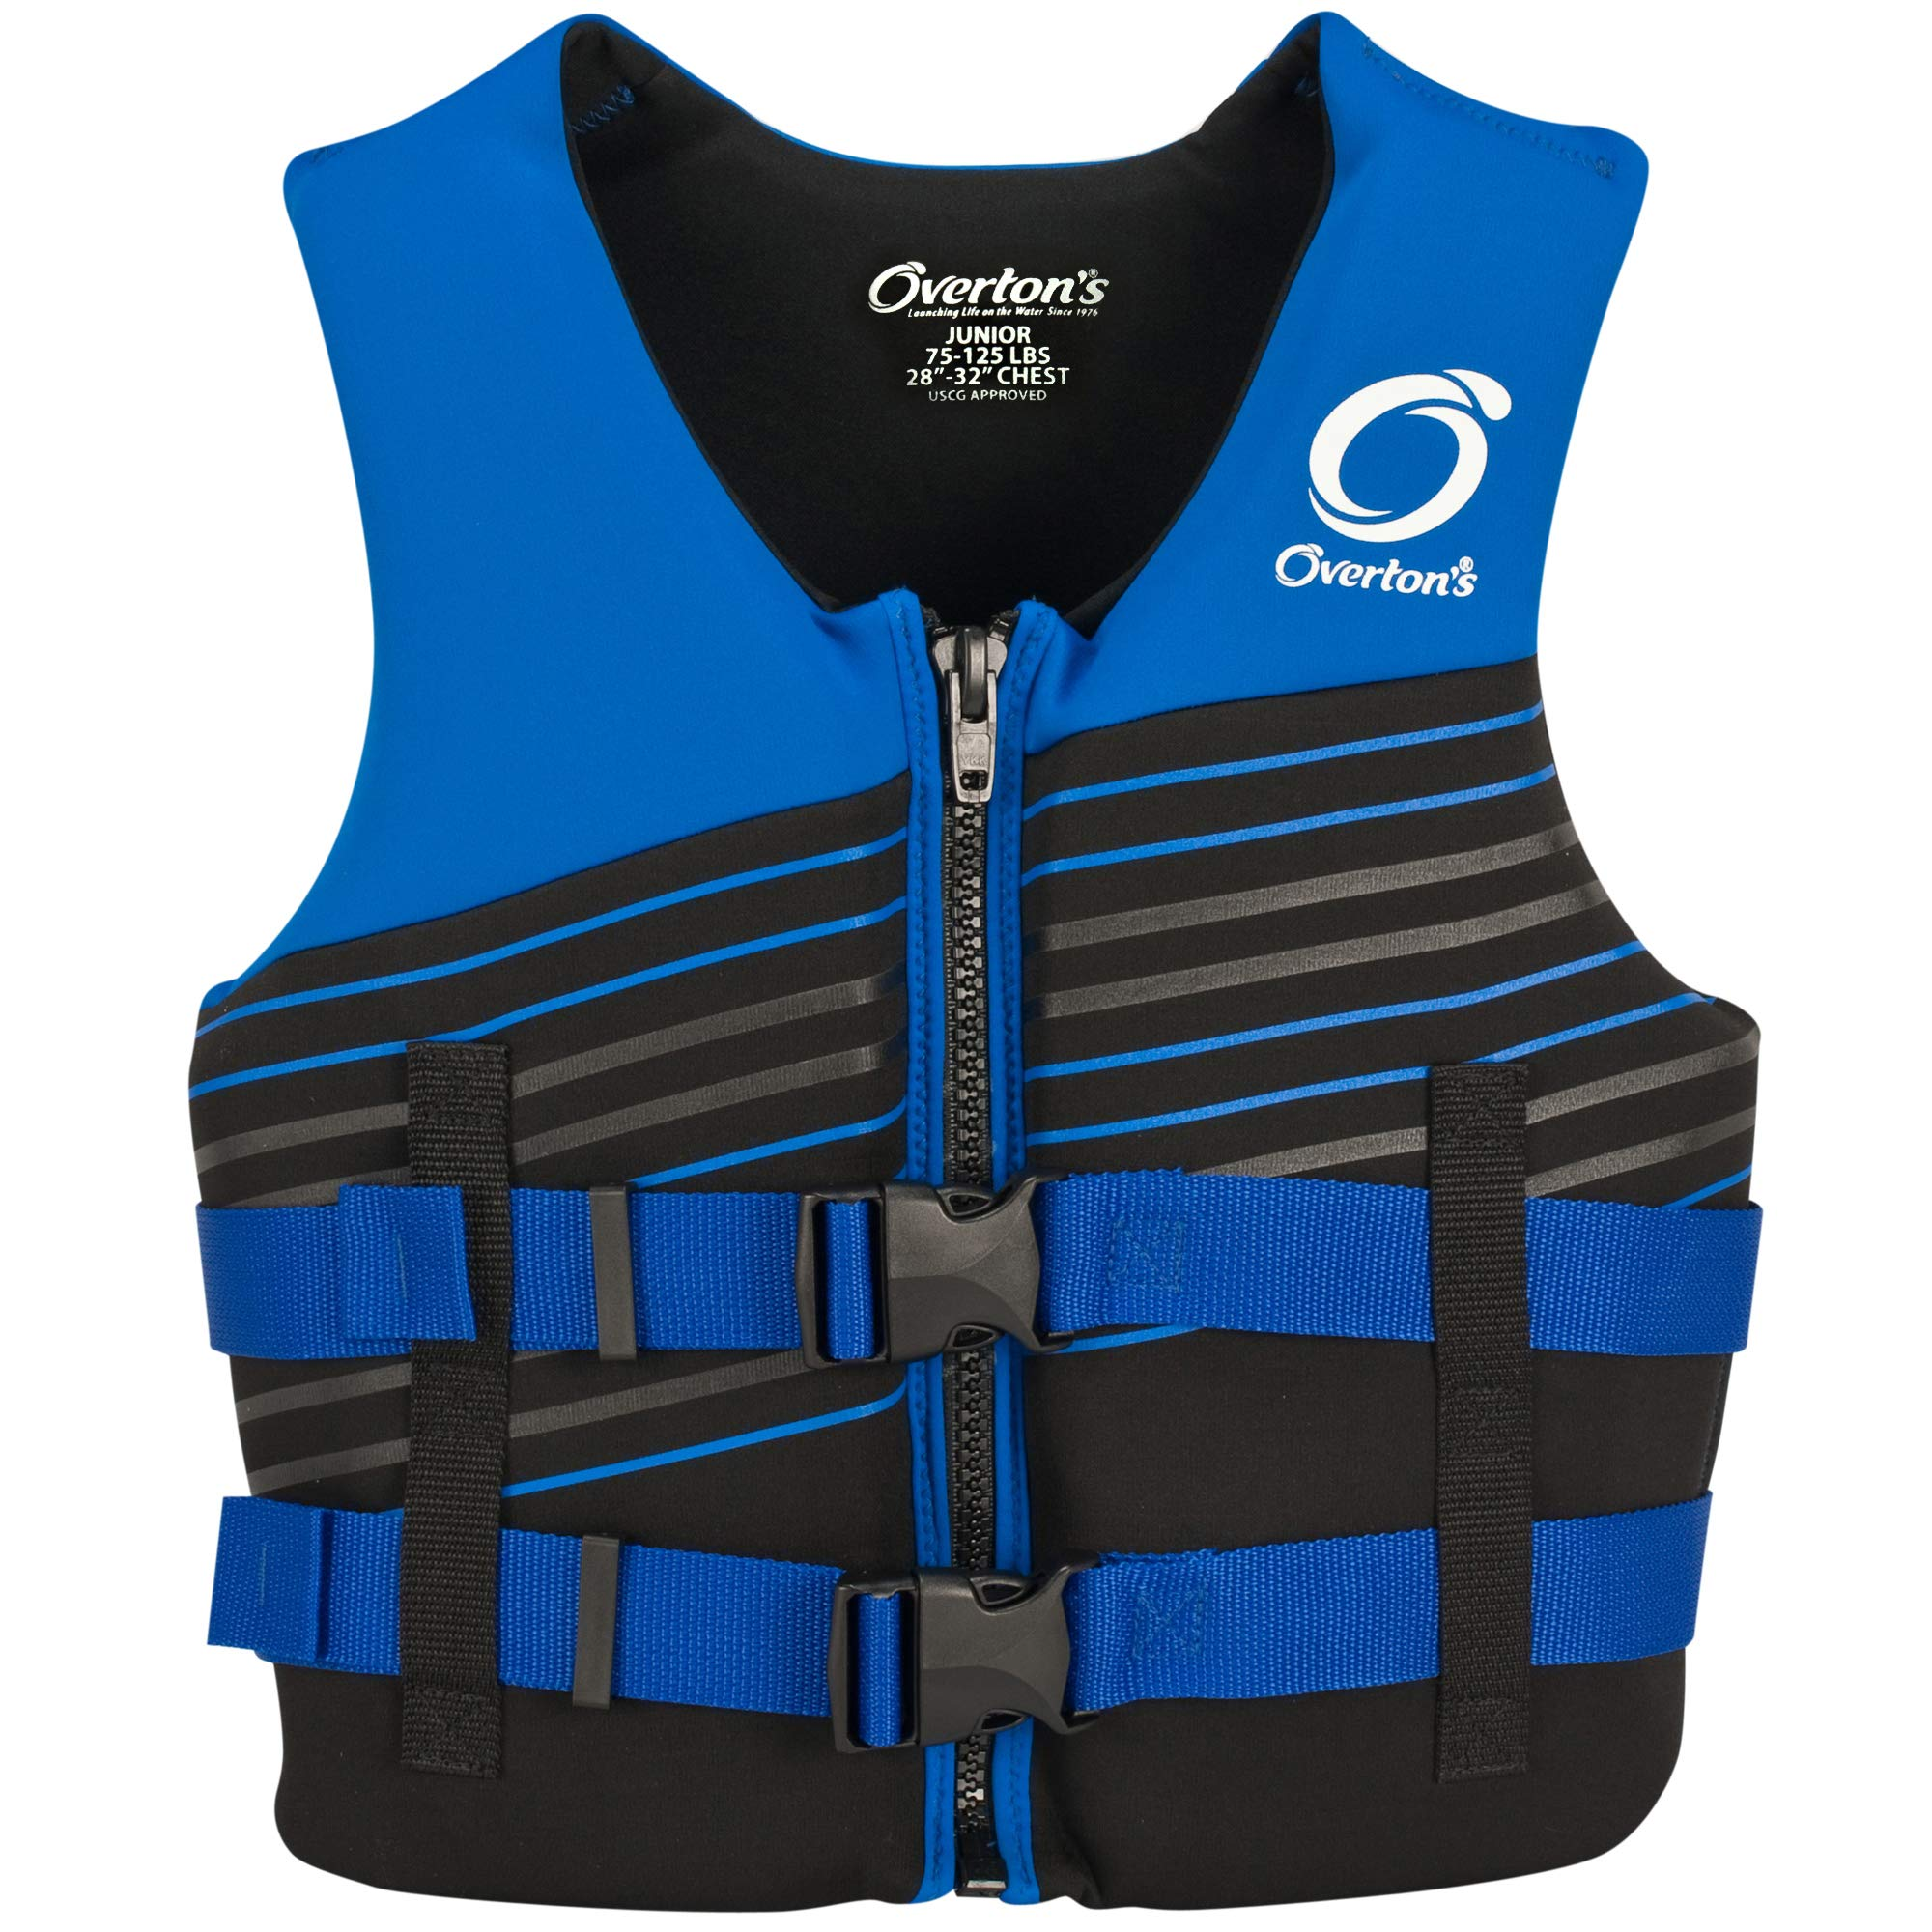 Overton's Junior Biolite Life Jacket Blue by Overton's